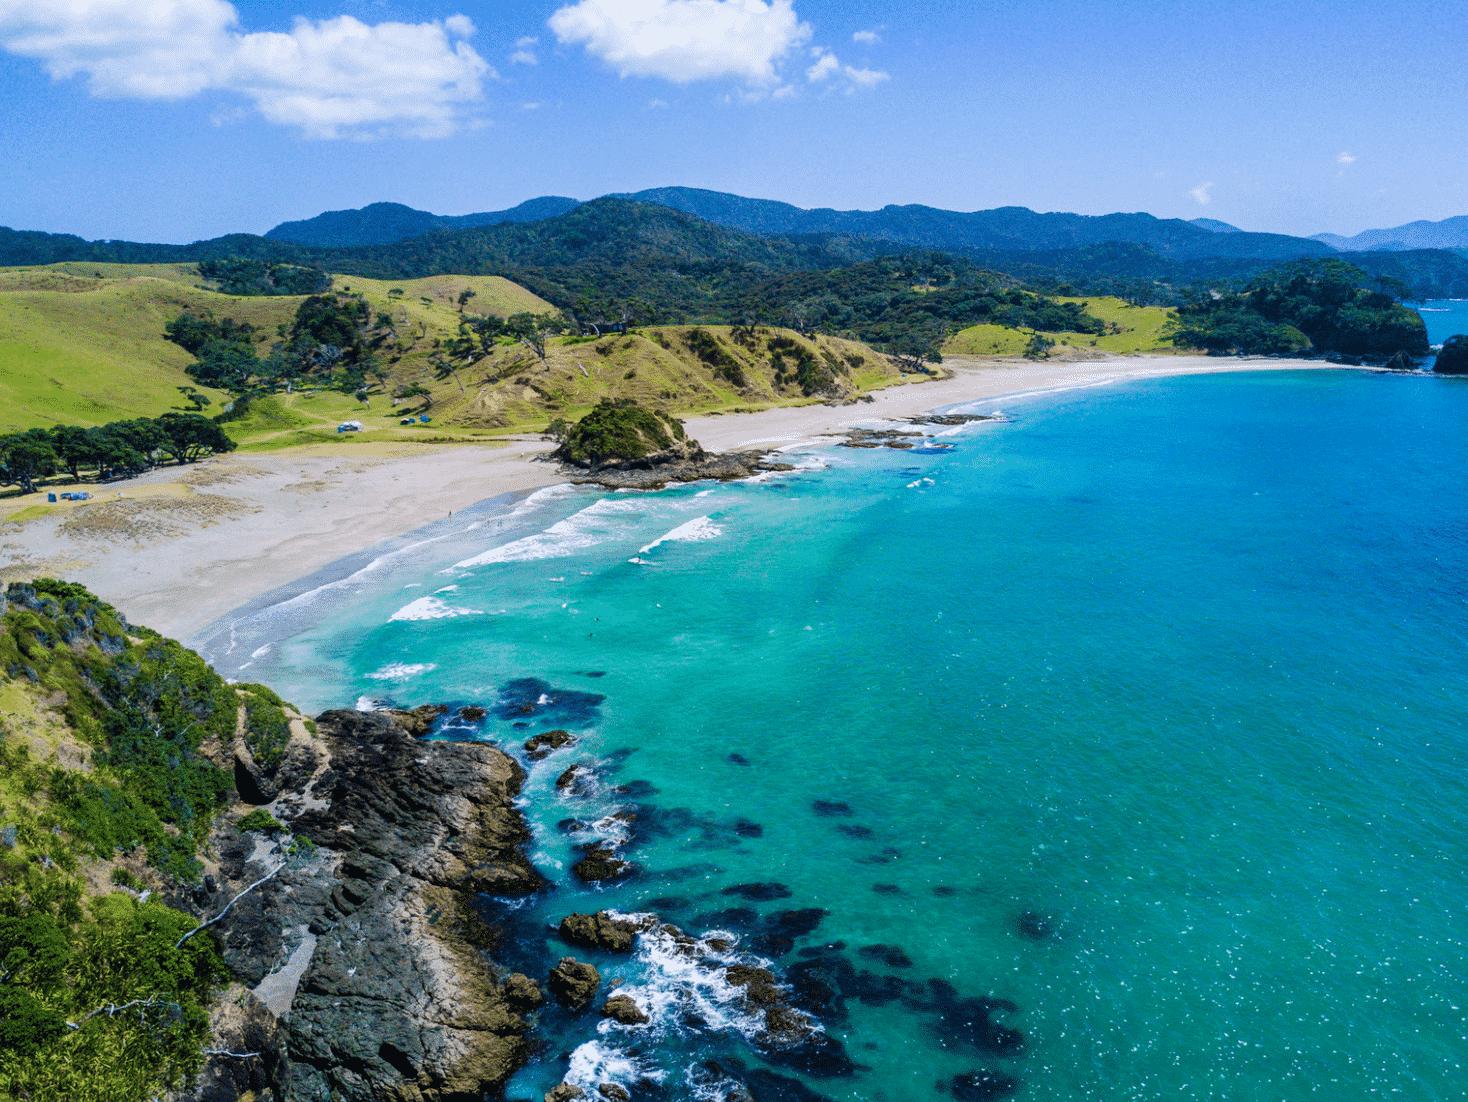 New Zealand: Pretty beautiful